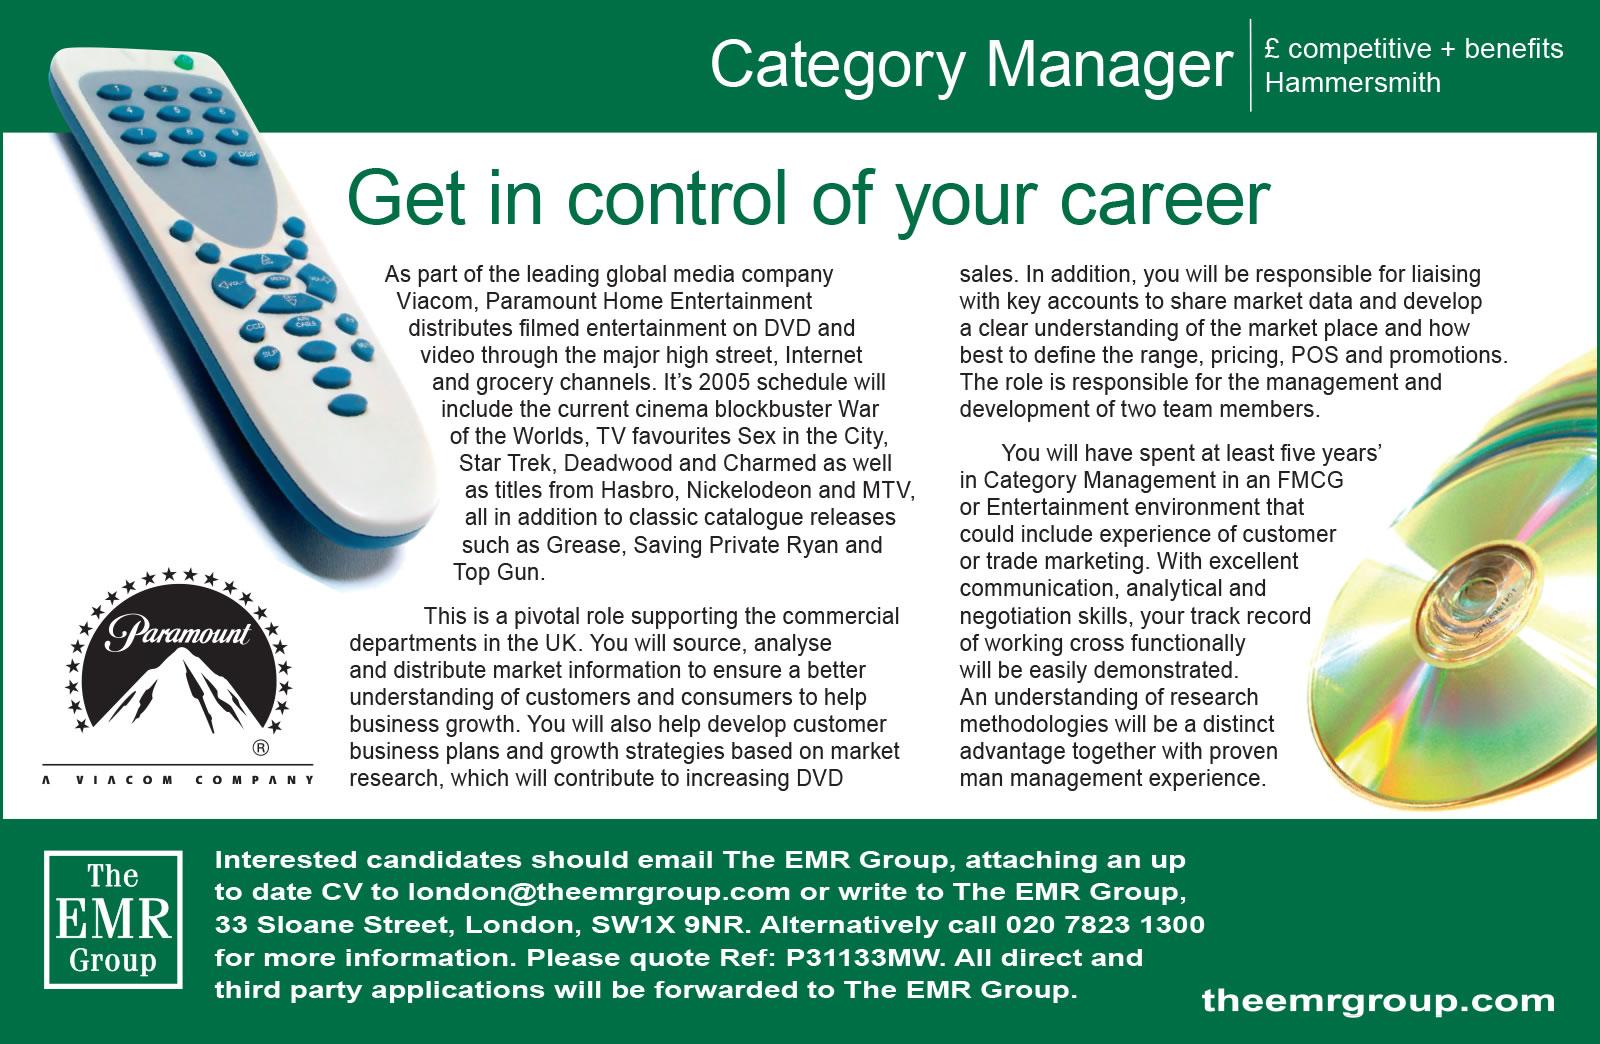 EMR - Recruitment advert - Paramount